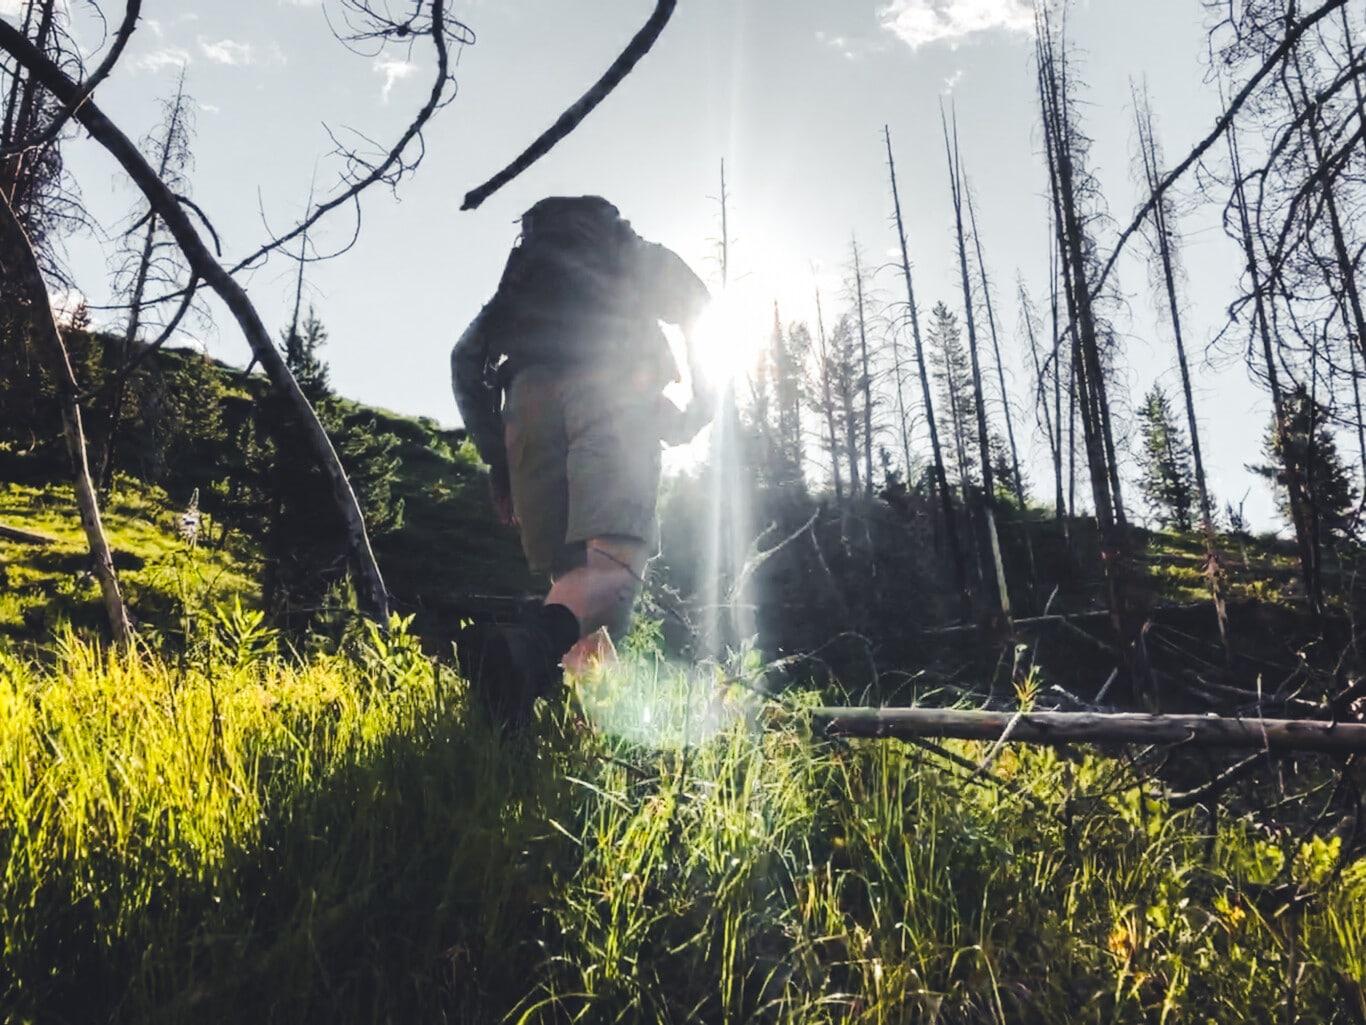 Hiking Bridger Teton National Forest